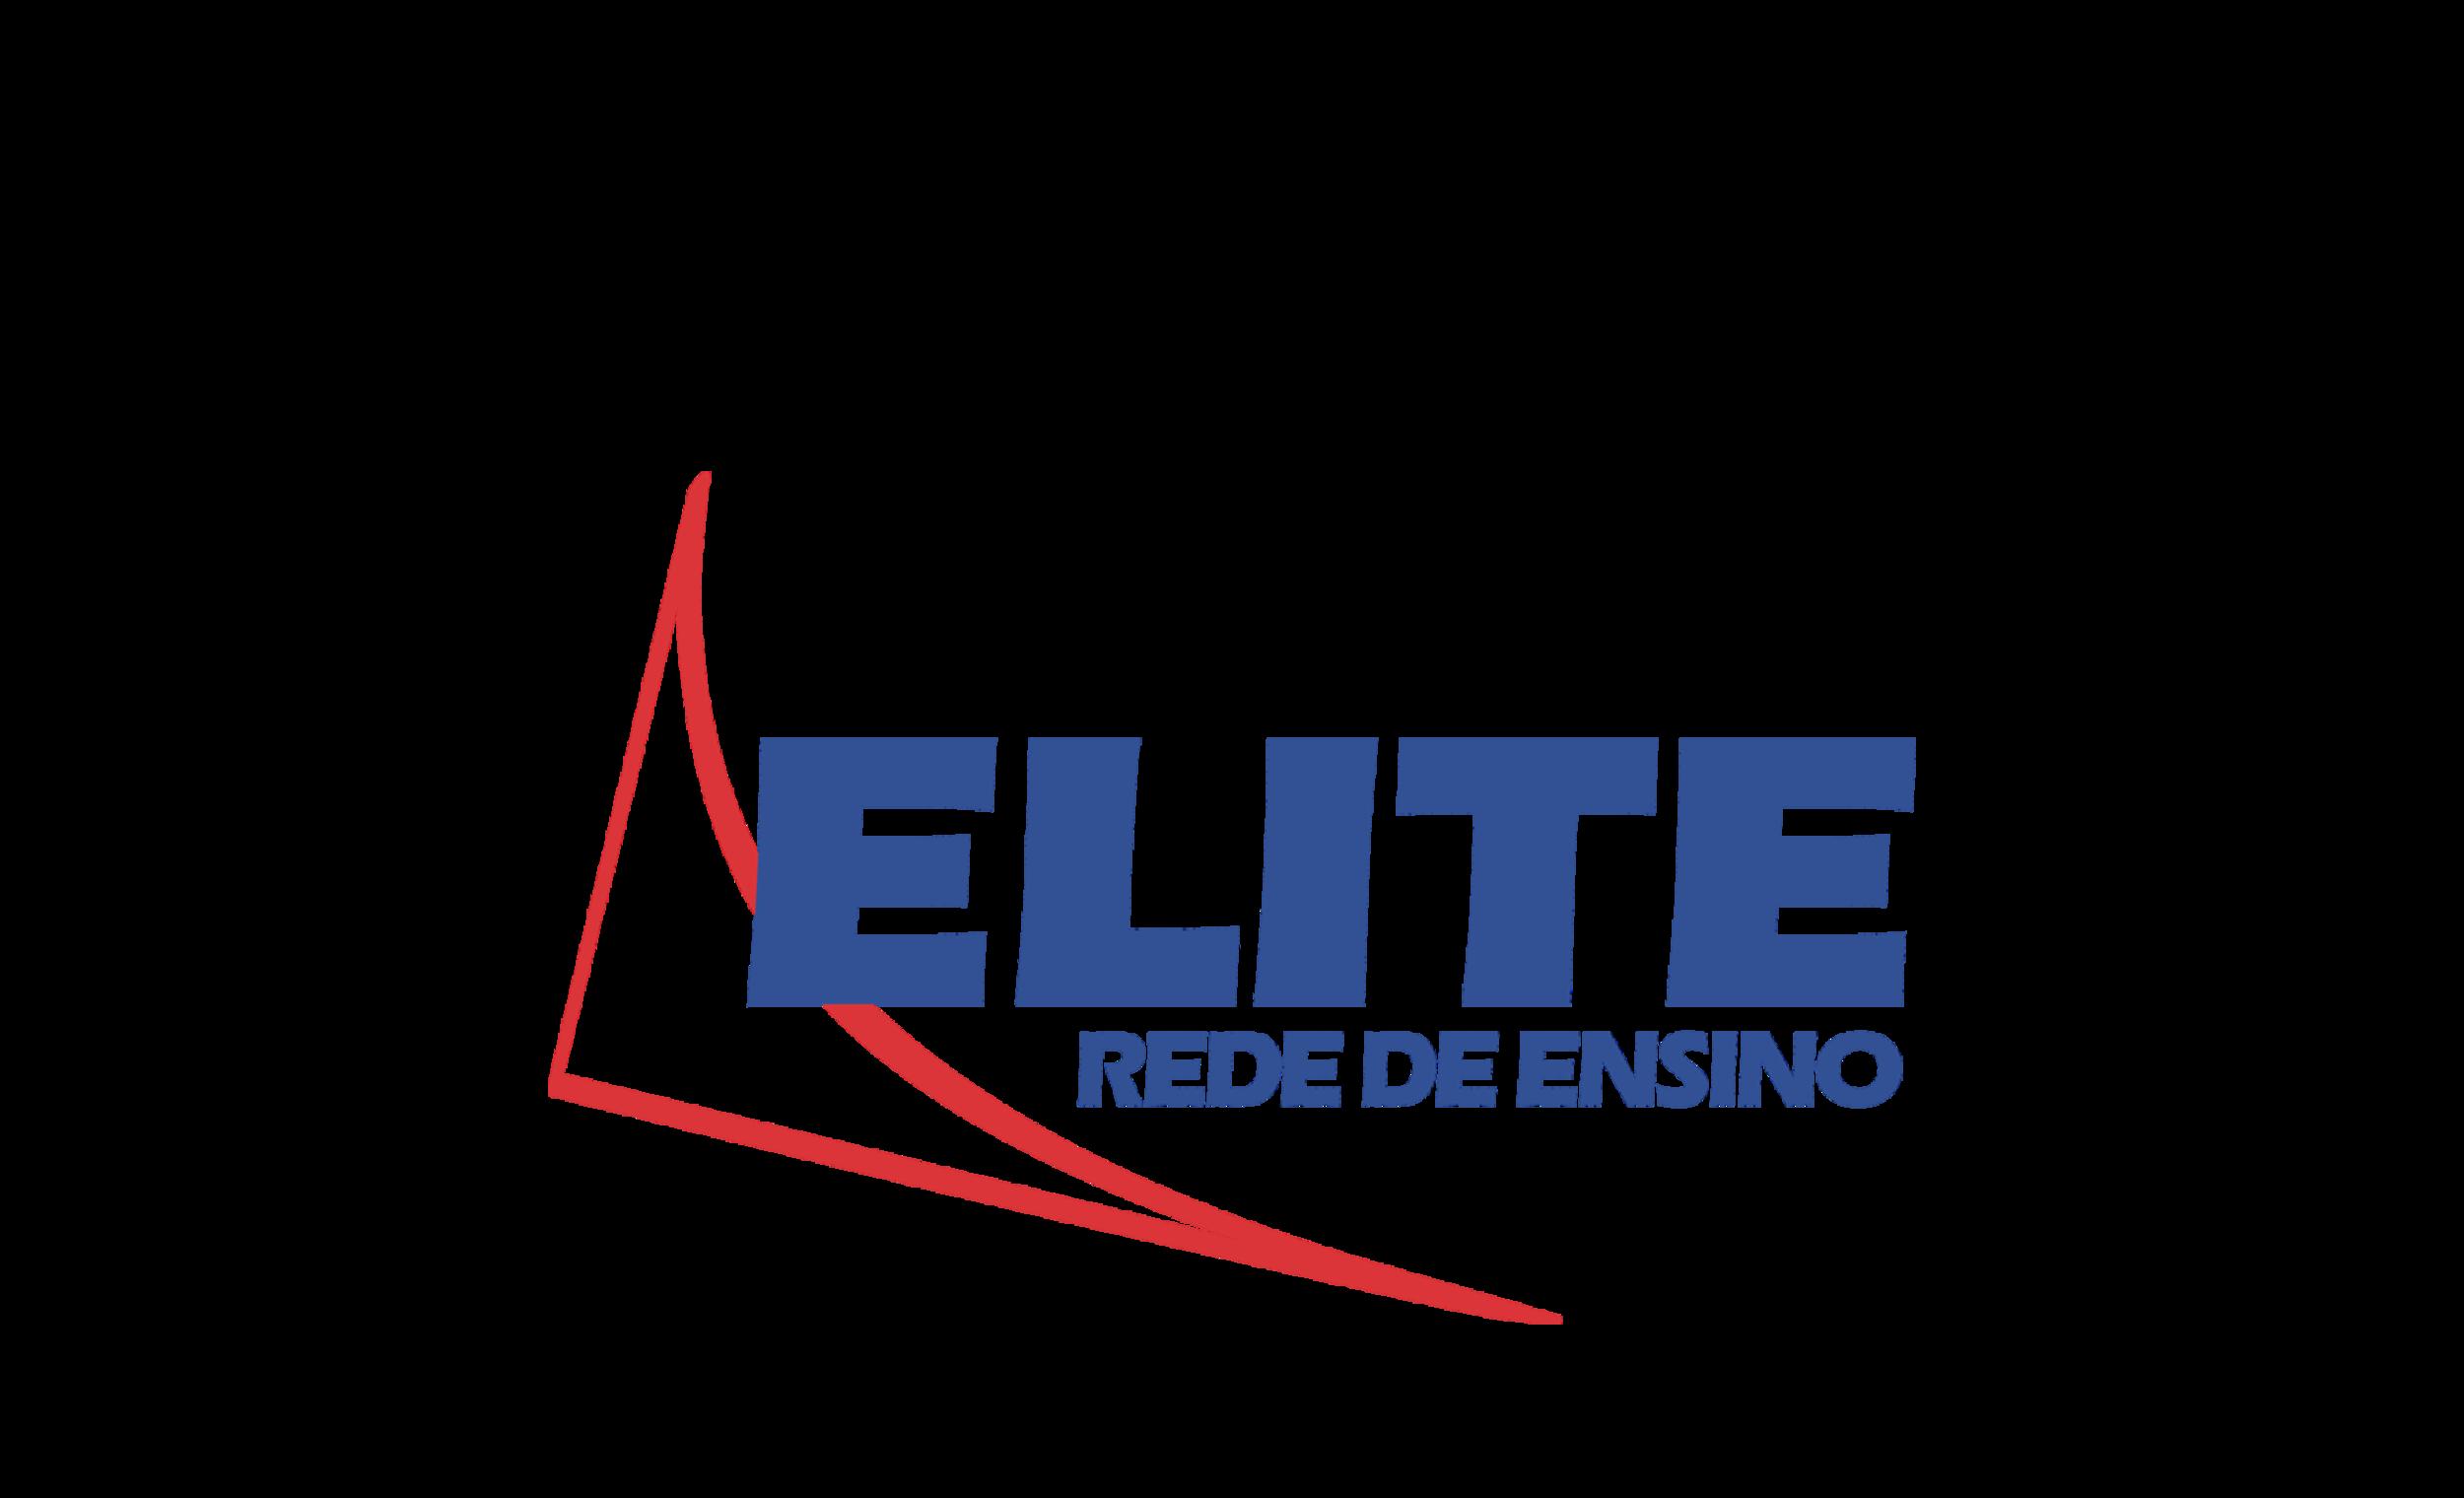 _0014_Elite-Rede-de-Ensino---Mace-e-Total.png./